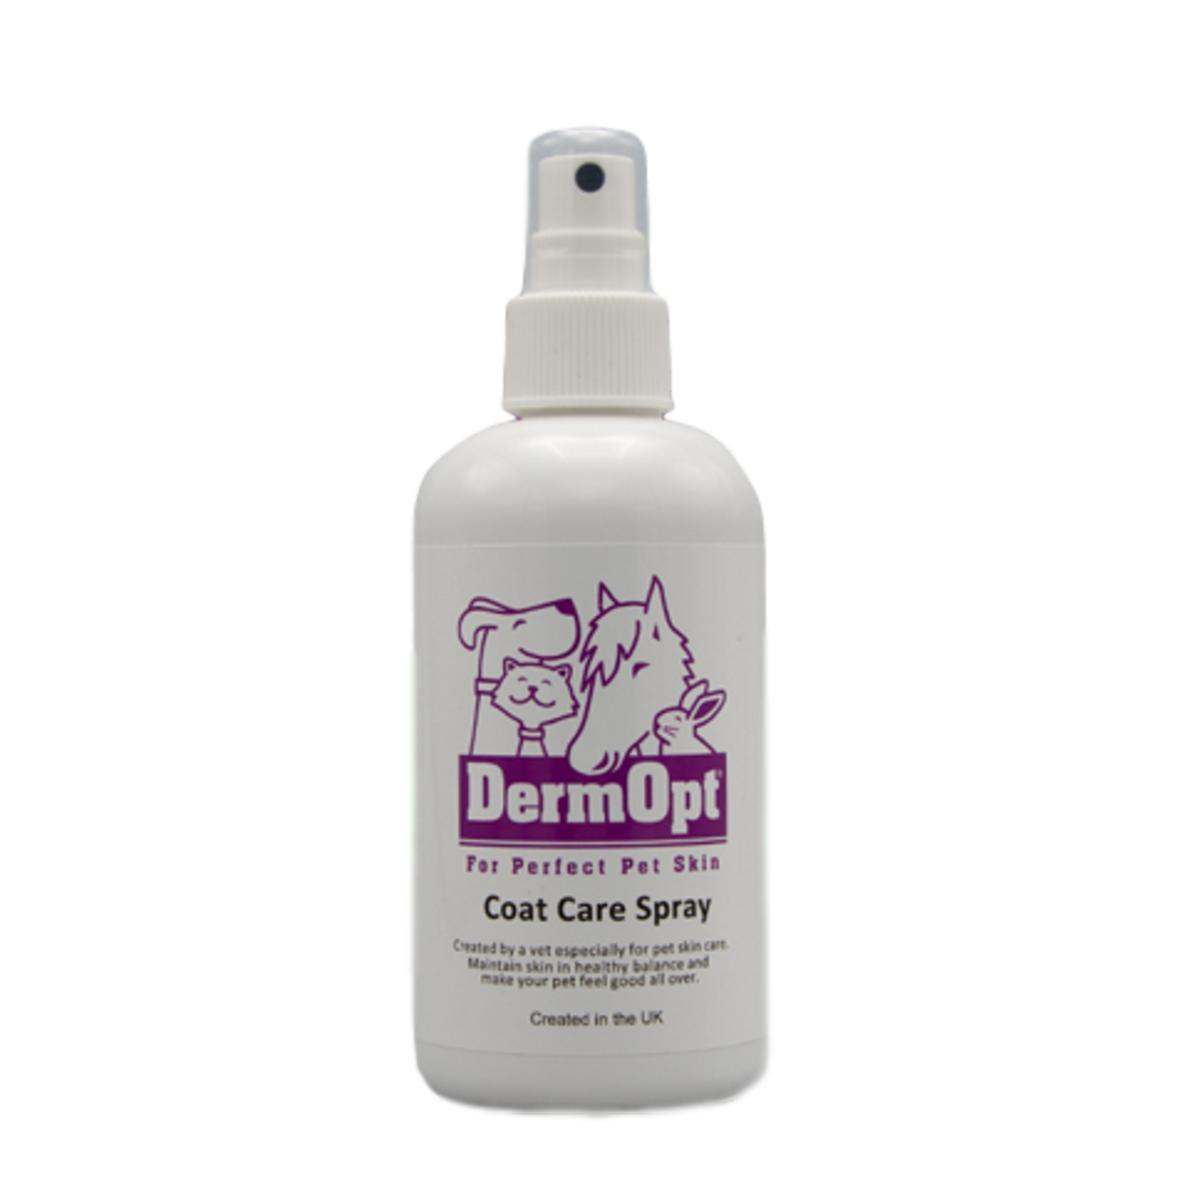 DermOpt Coat Care Spray 250ml